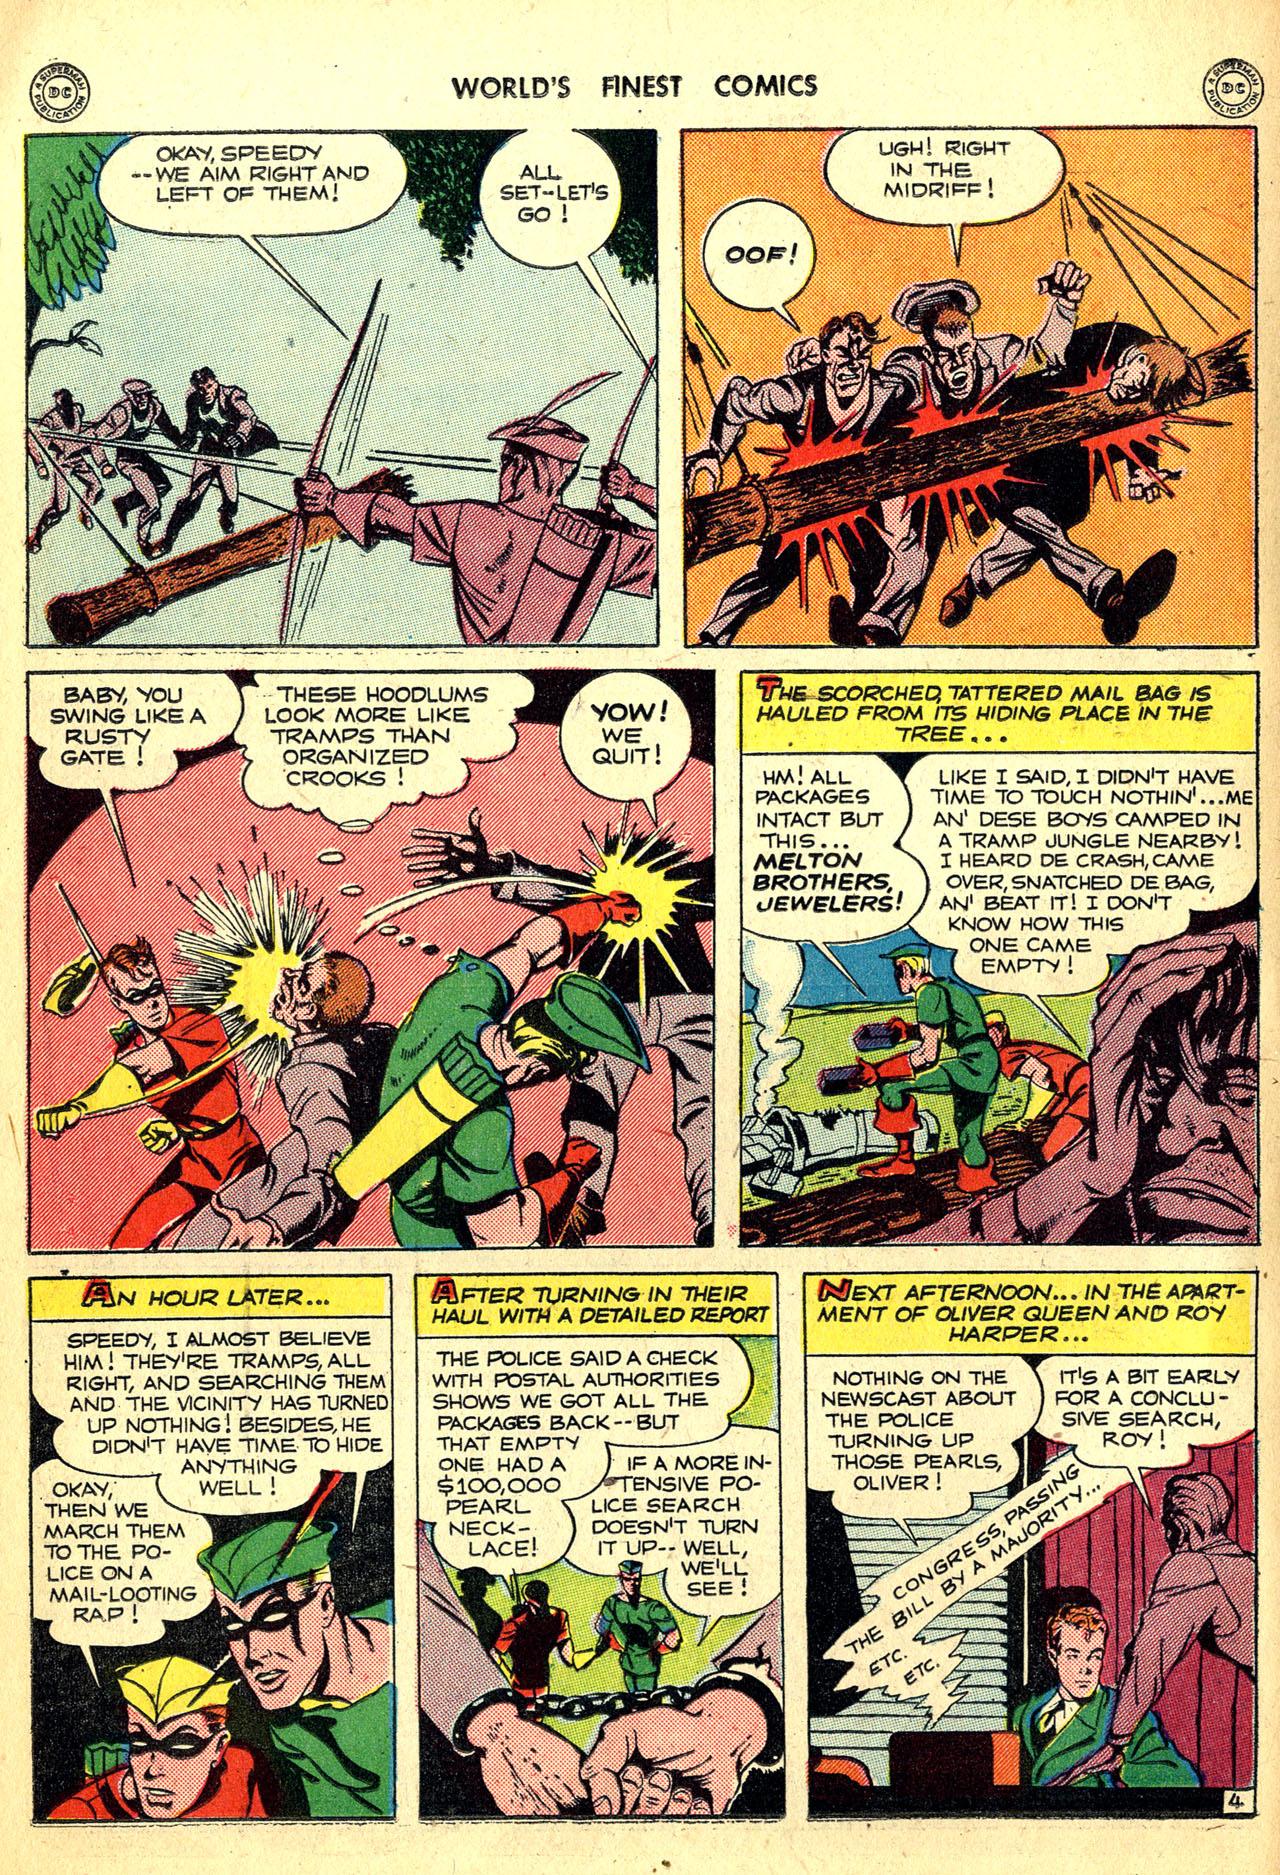 Read online World's Finest Comics comic -  Issue #18 - 52